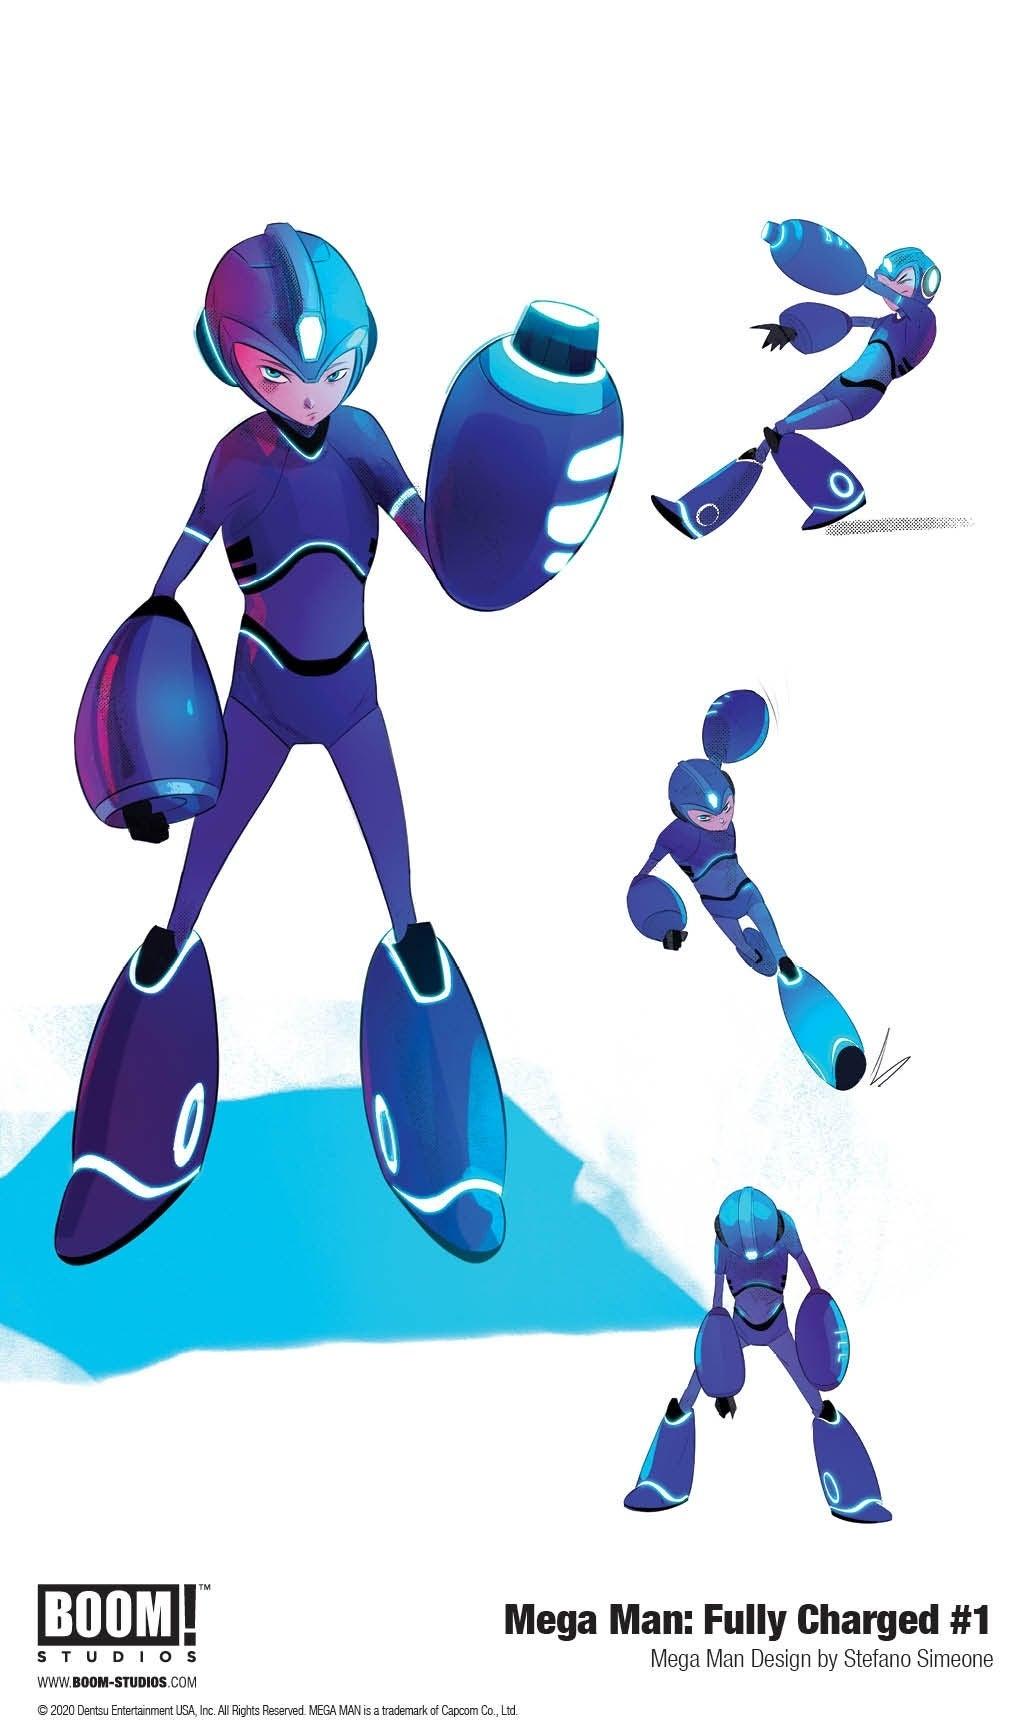 Mega Man: Fully Charged (Divulgação / BOOM! Studios)